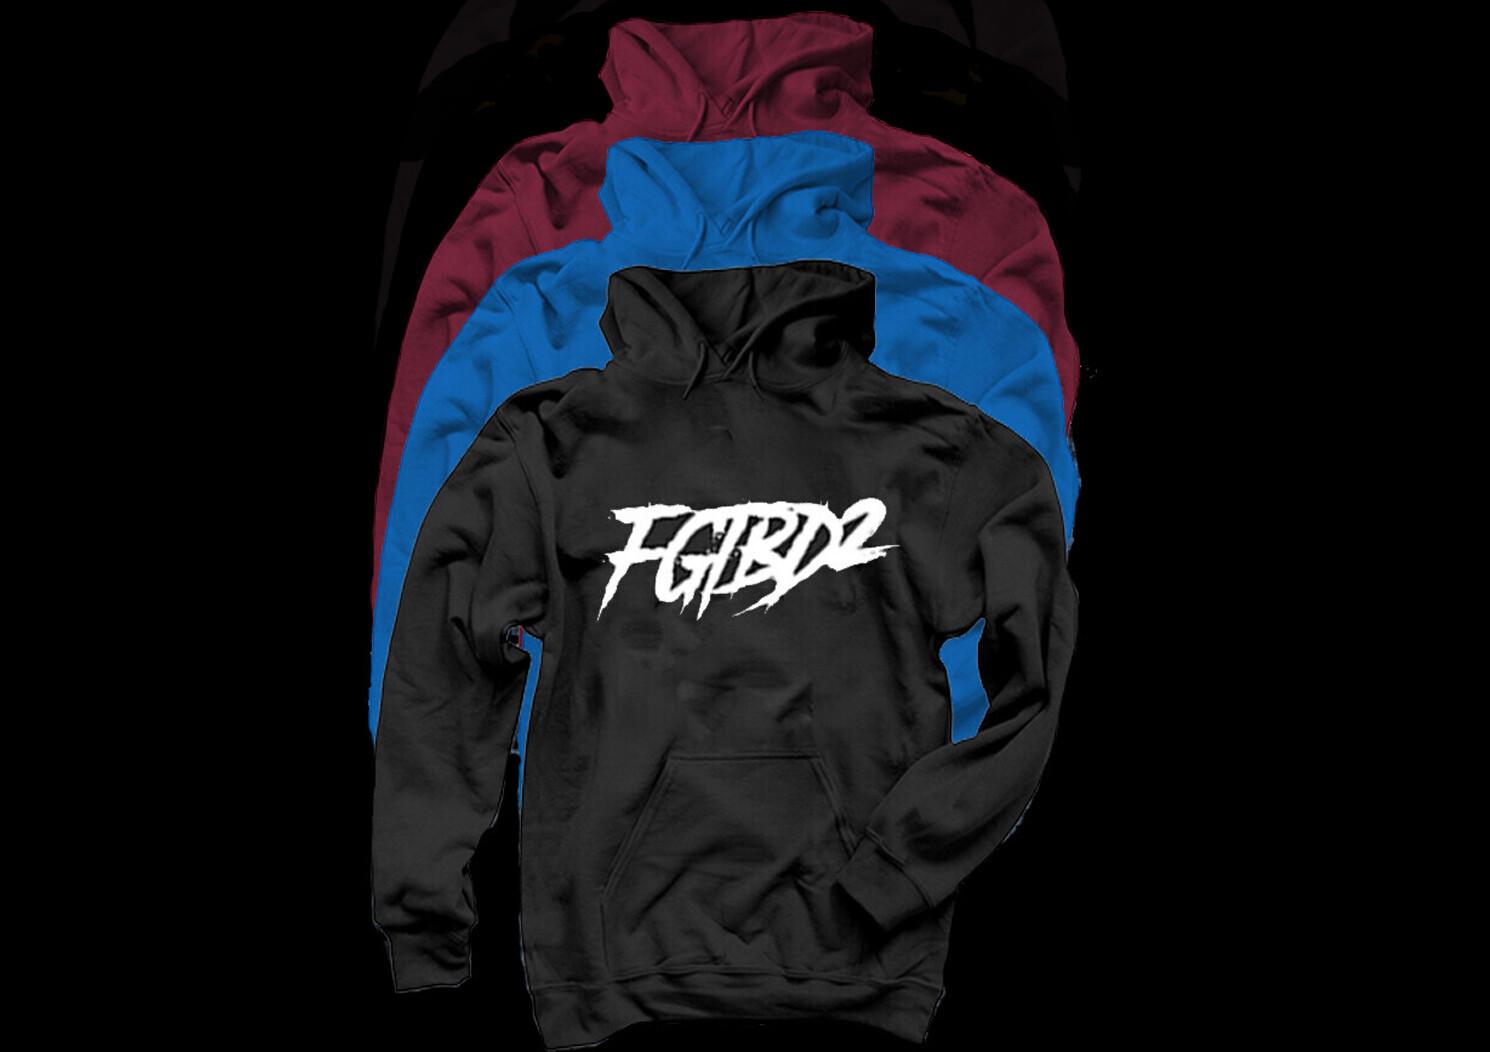 #FGTBD2 Hoodie + FREE GIFT